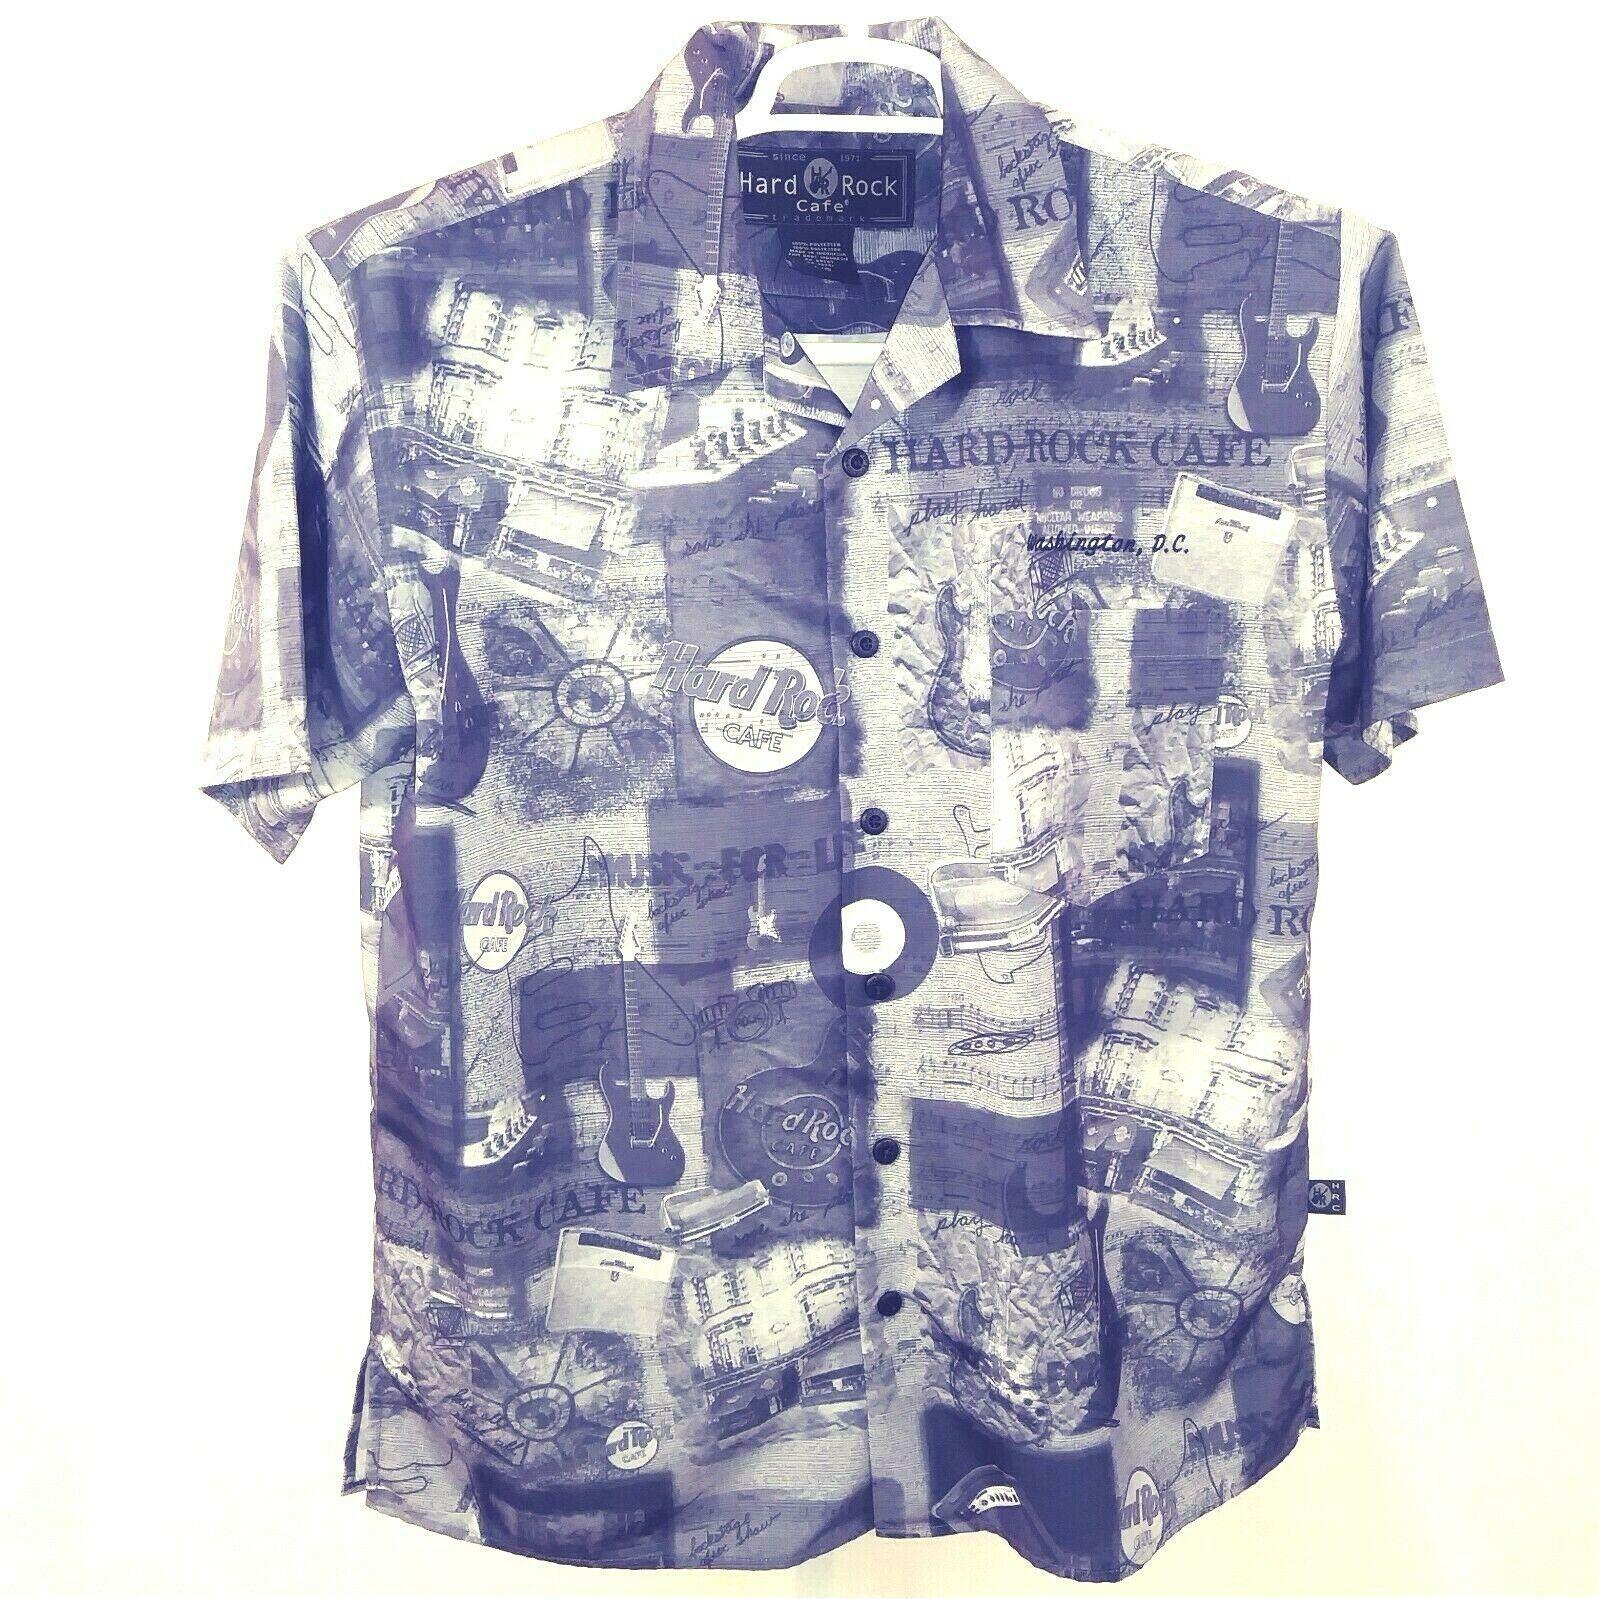 27a7f5dbd9cd Hard Rock Cafe D.C. Button Front Short Sleeve Shirt Rock n Roll Print Gray L  - $19.31